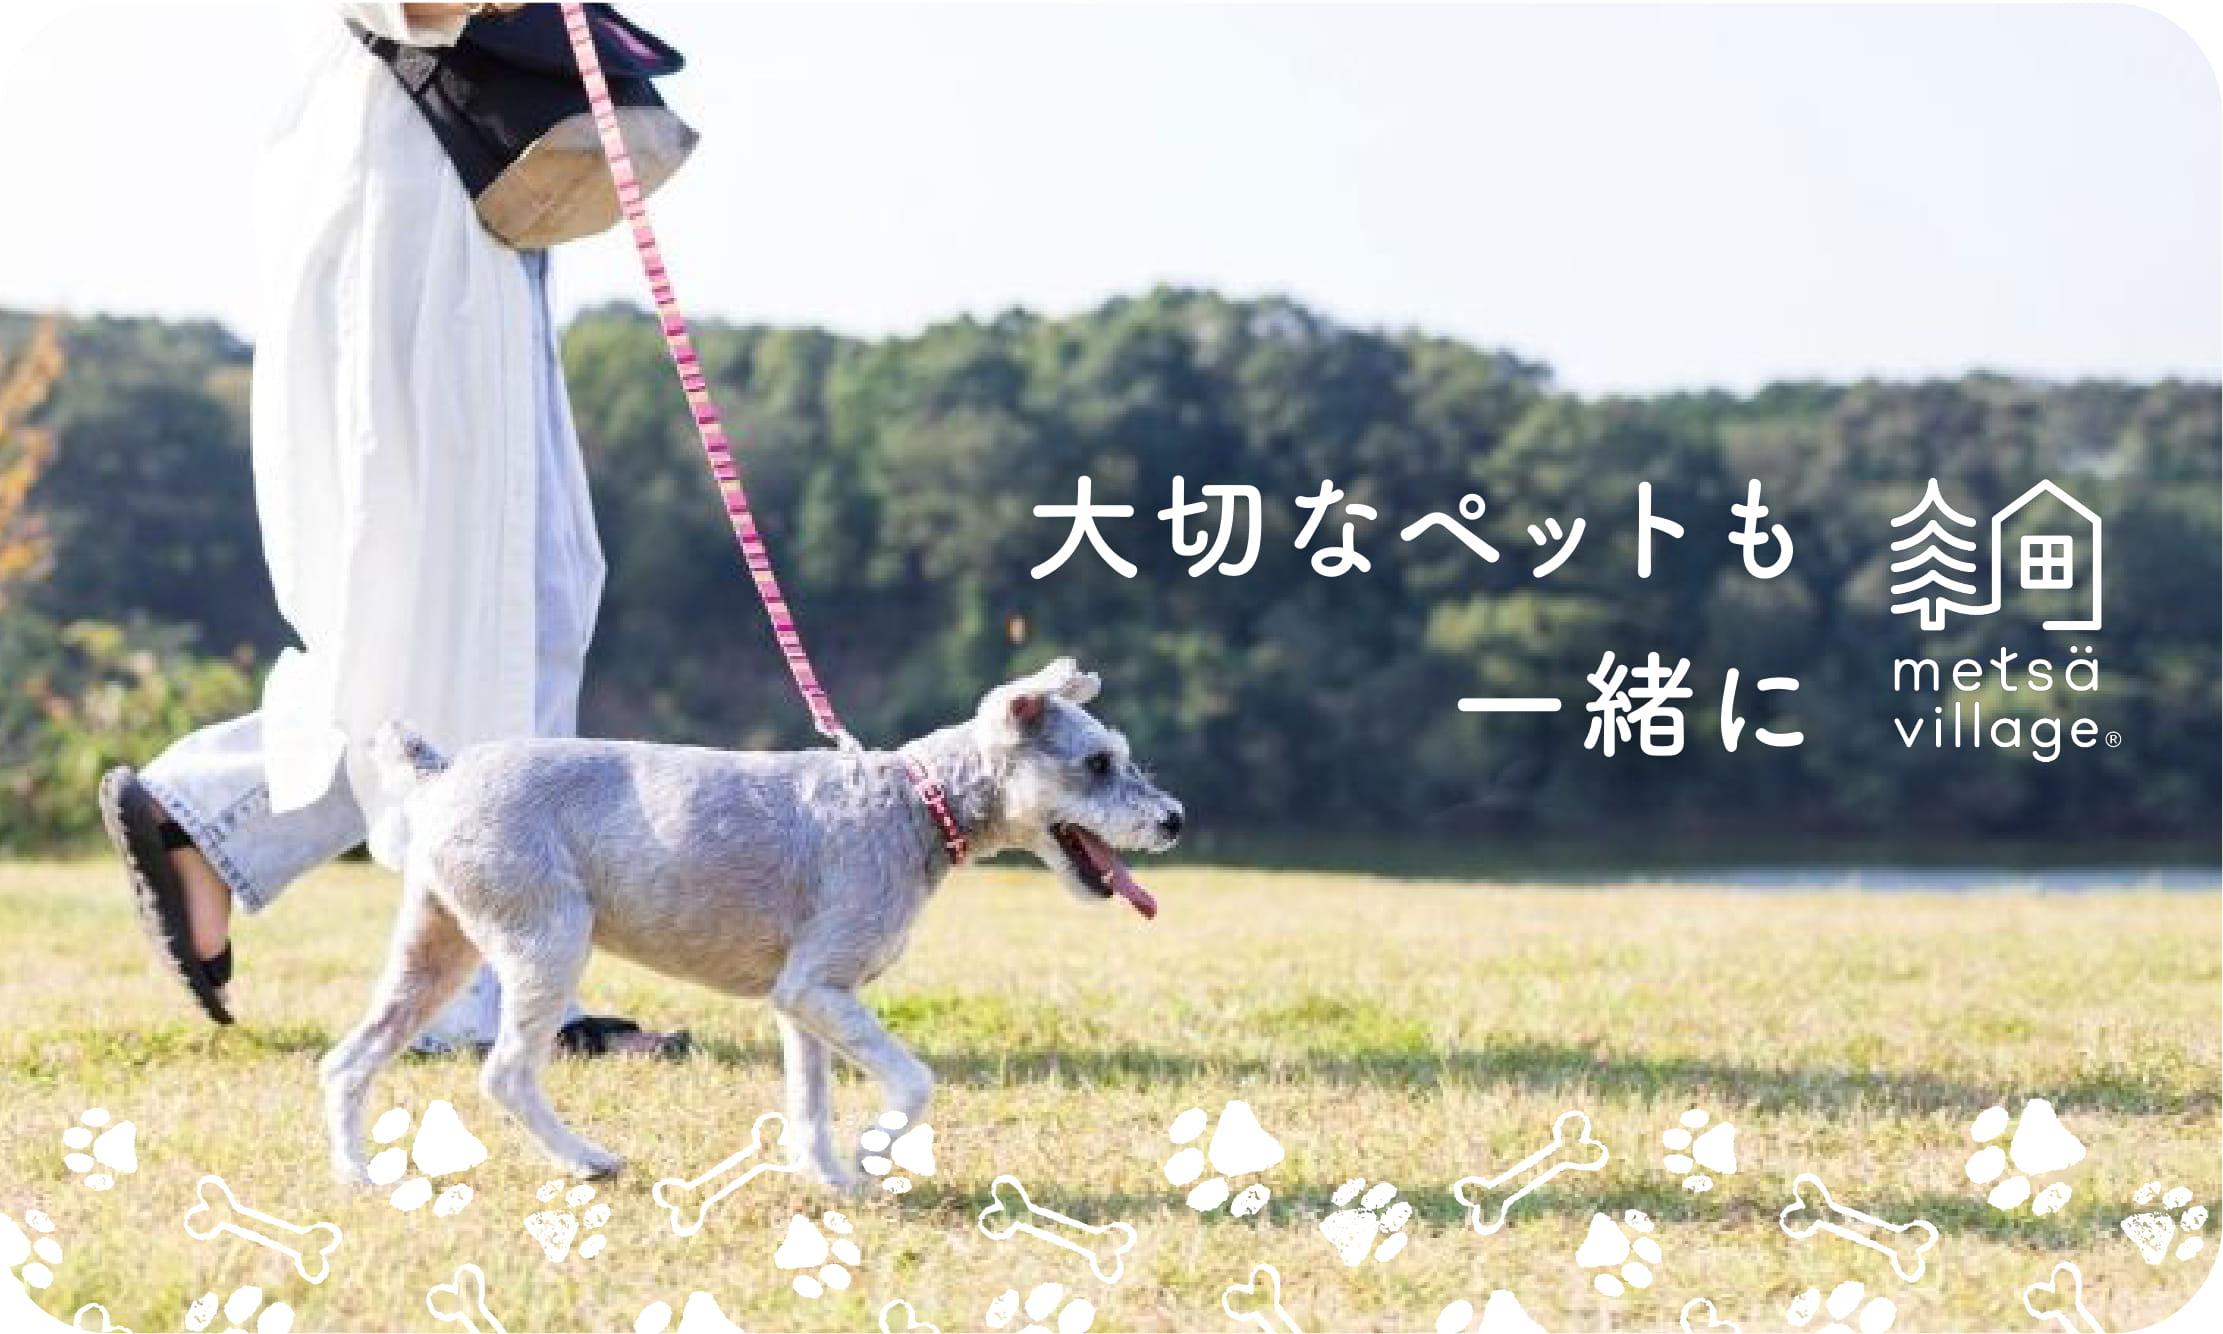 With your precious pet